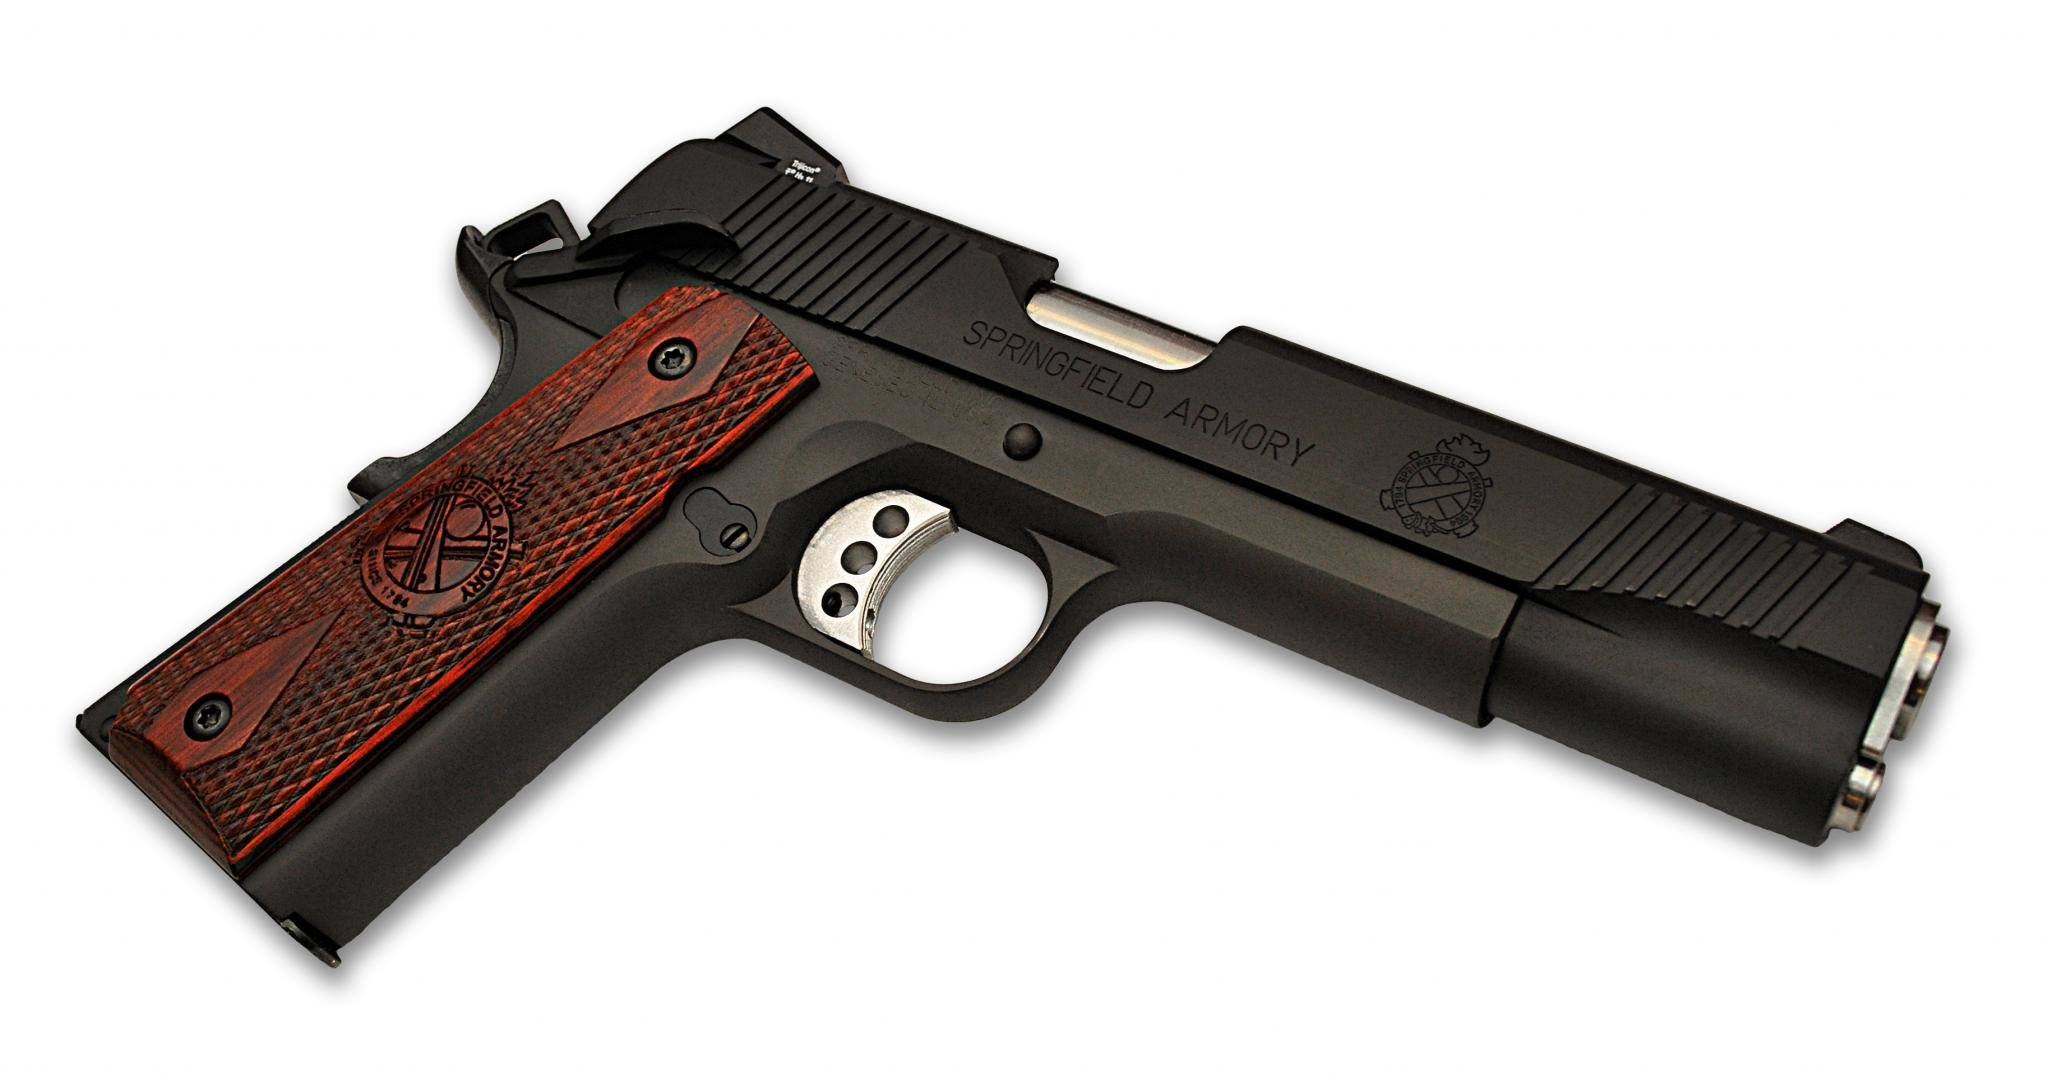 free download springfield armory 1911 pistol wallpaper id:213686 hd